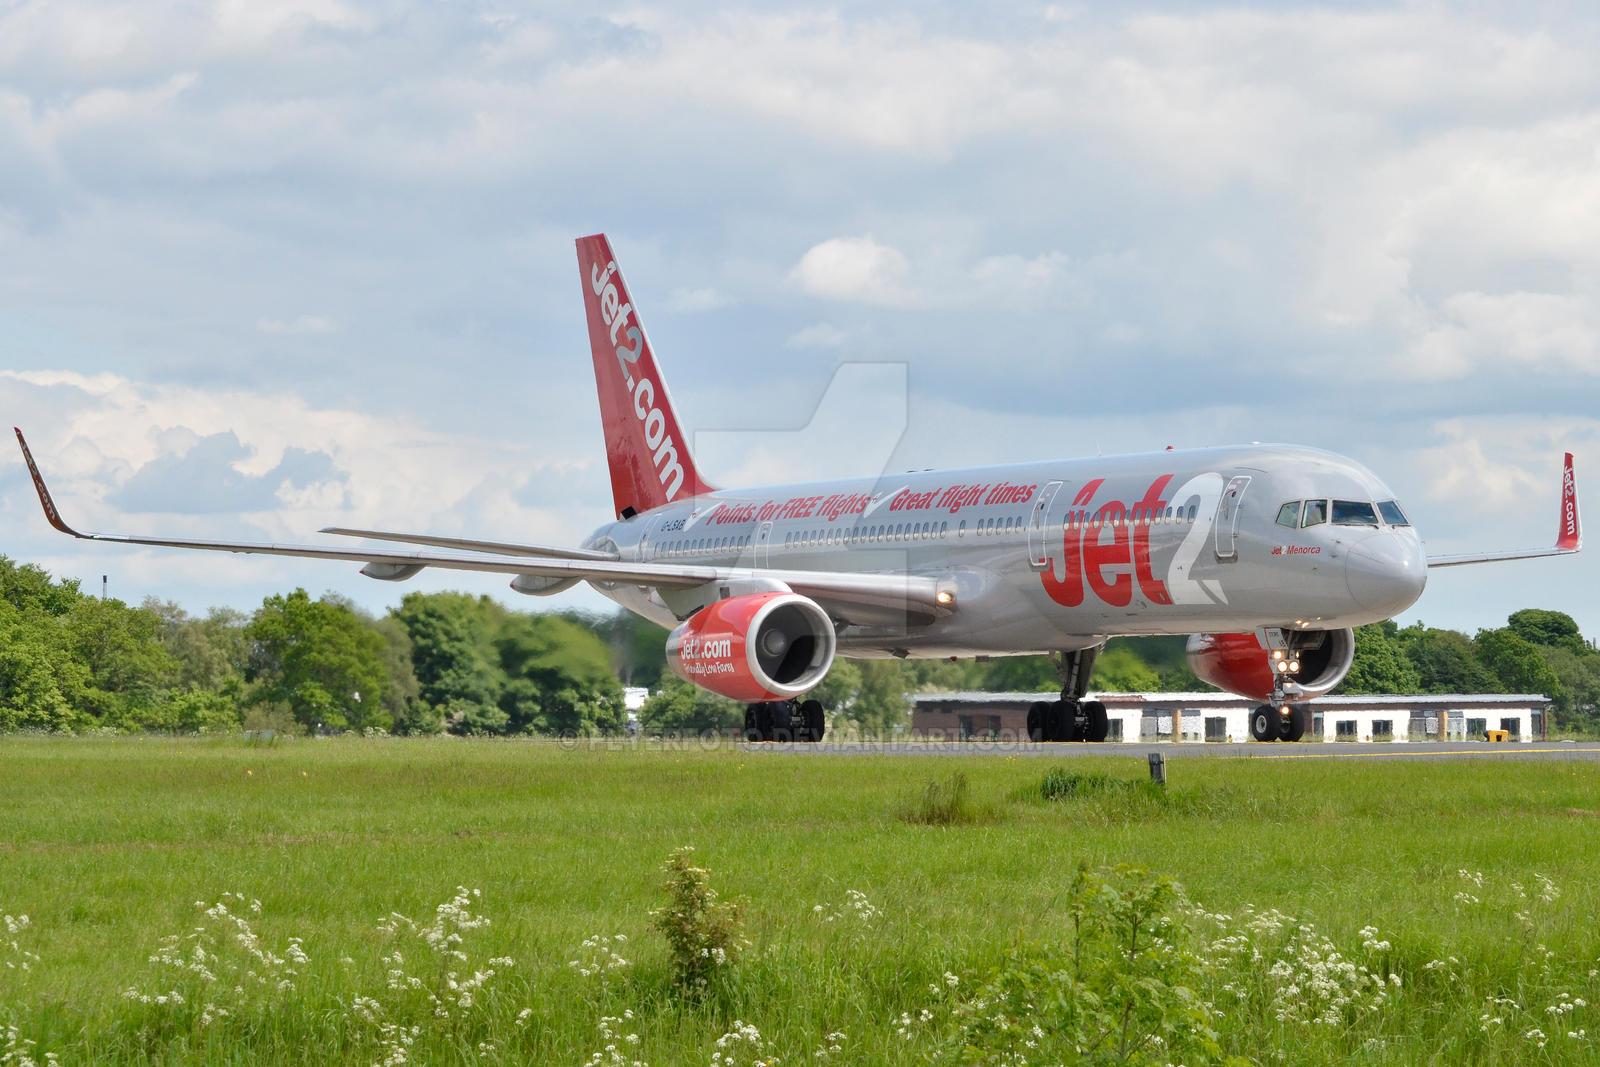 RAF jets intercept Jet2 flight after passenger assaults people on board